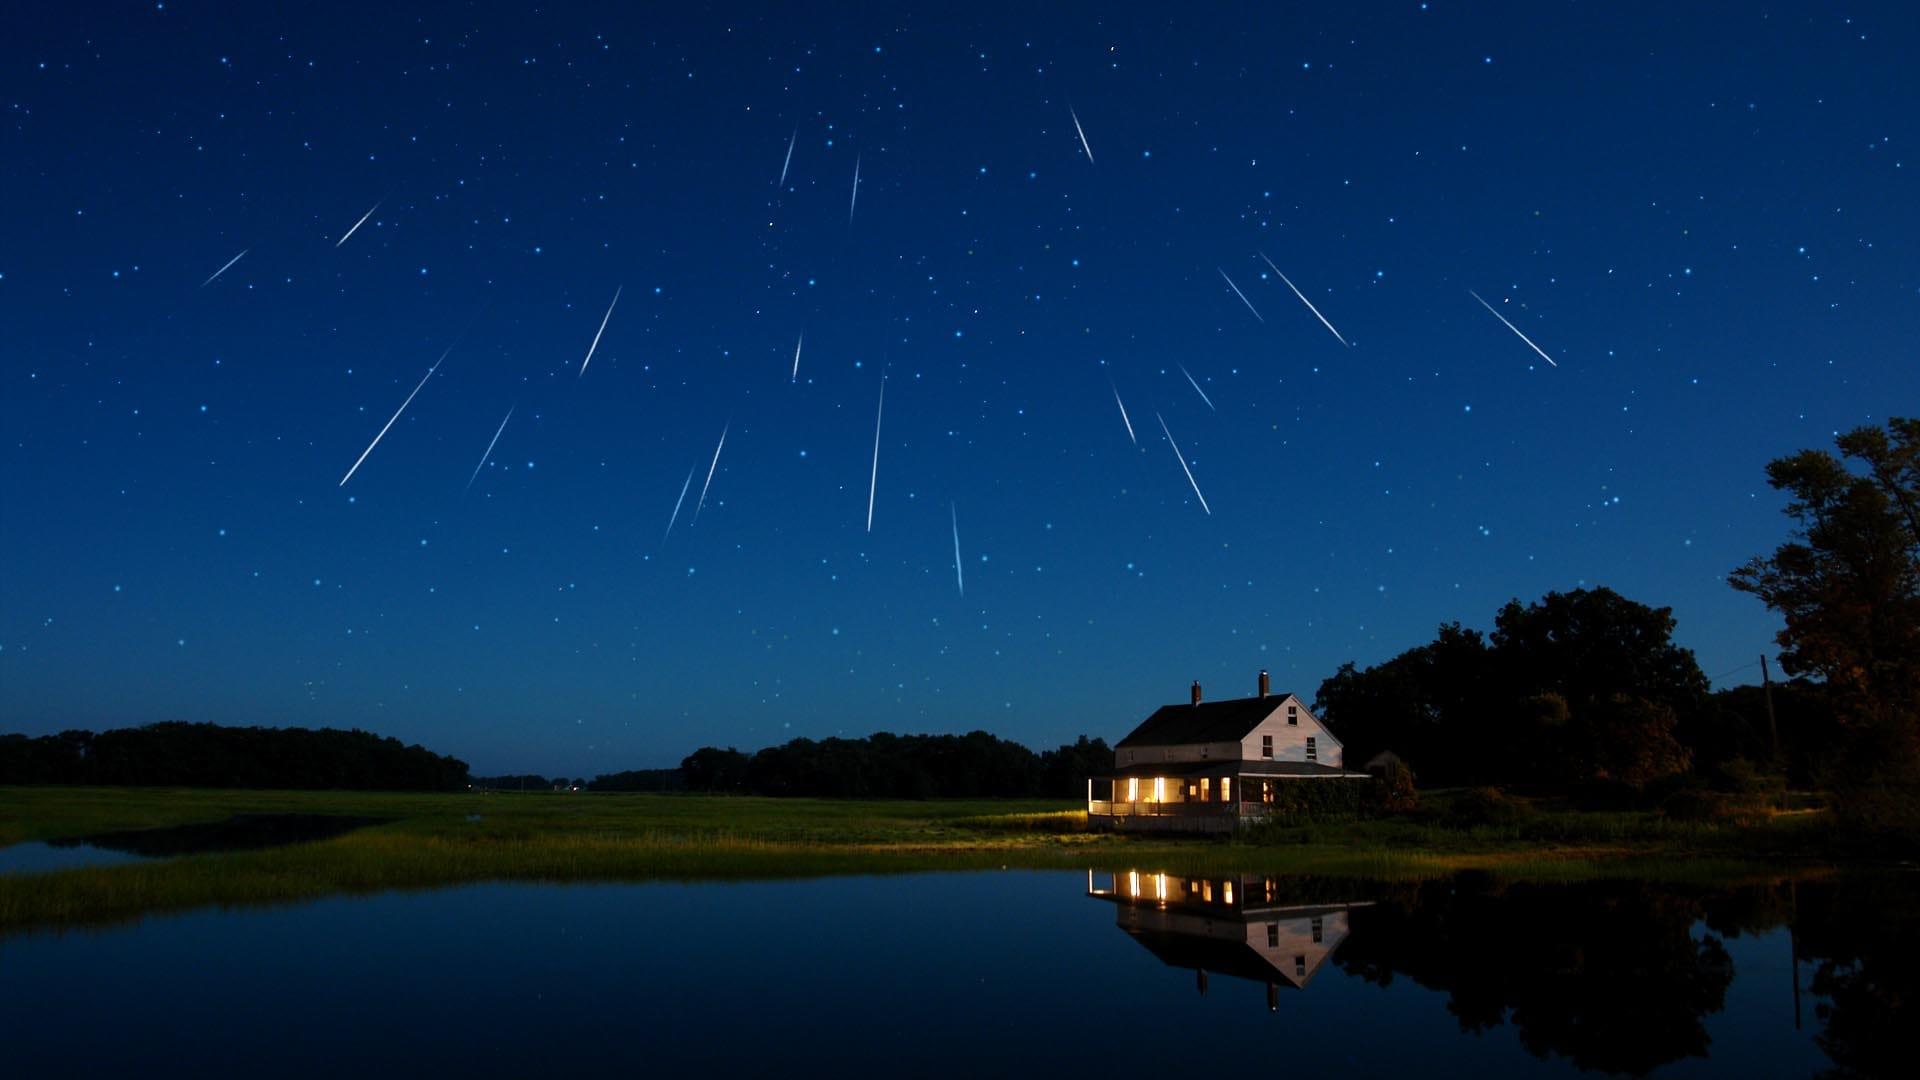 Perseid Meteor Shower 2021: Viewing Guide